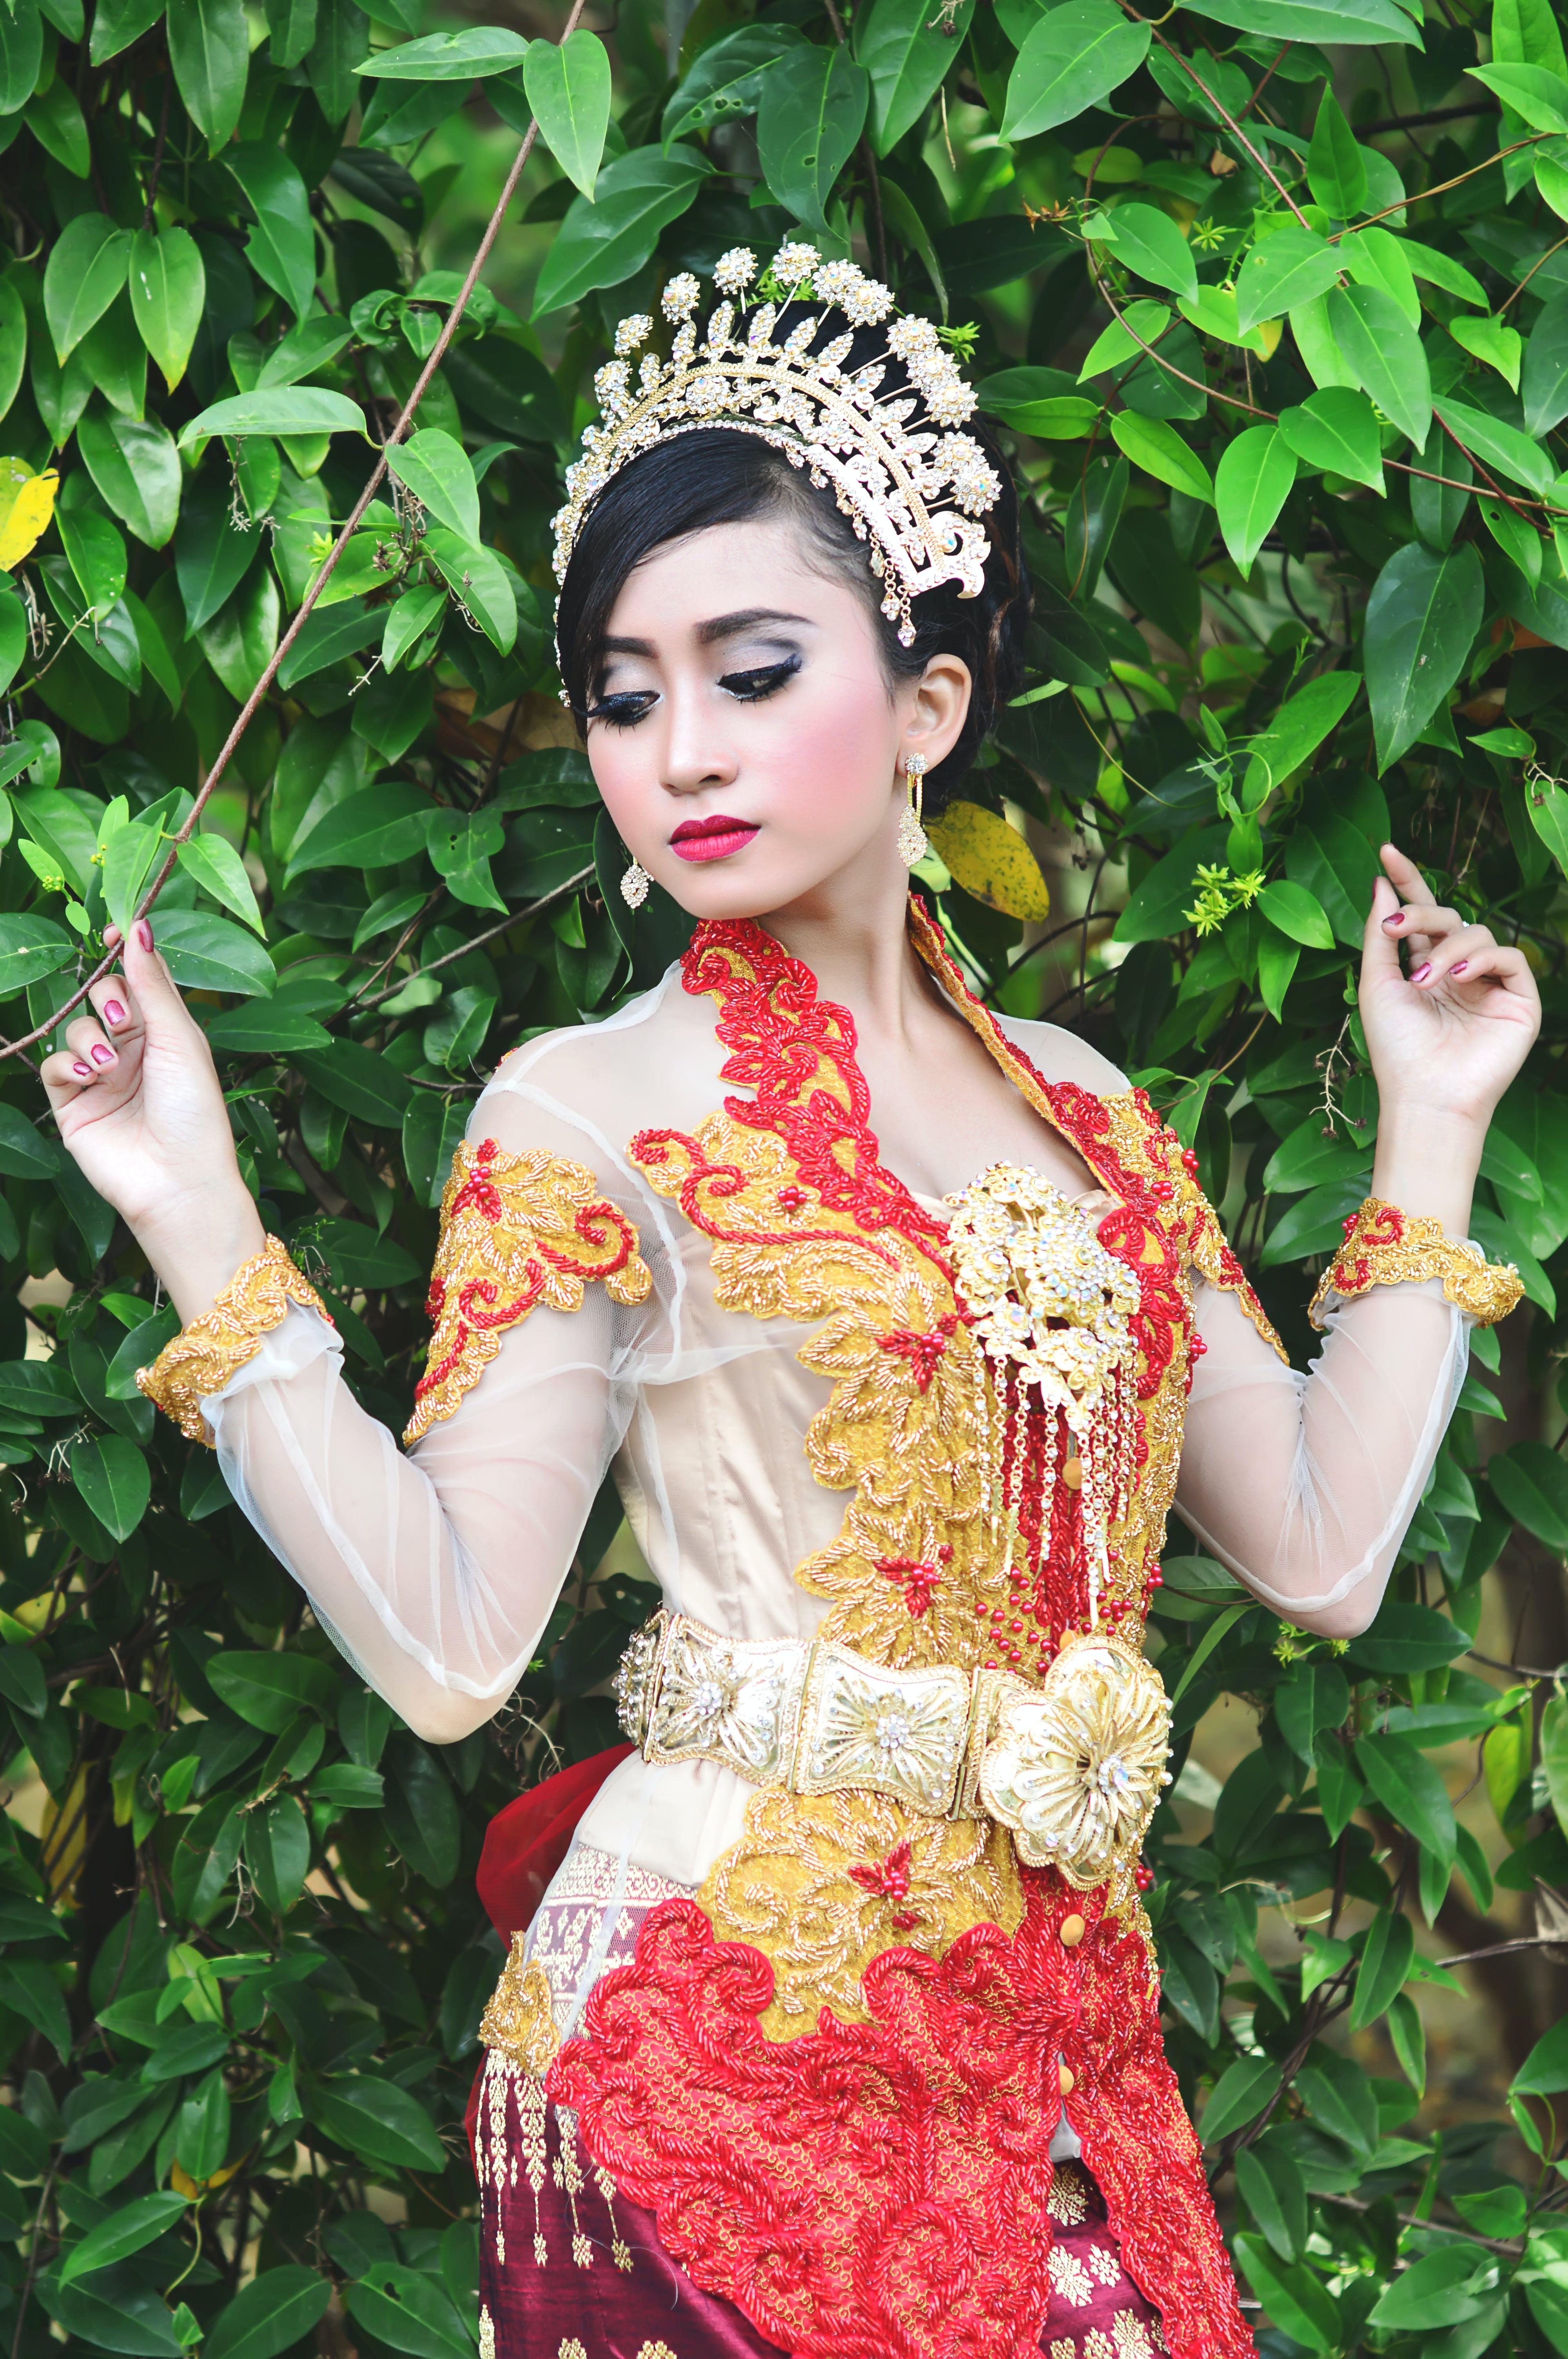 Free stock photo of Adobe Photoshop, angel, asian girl, beautiful